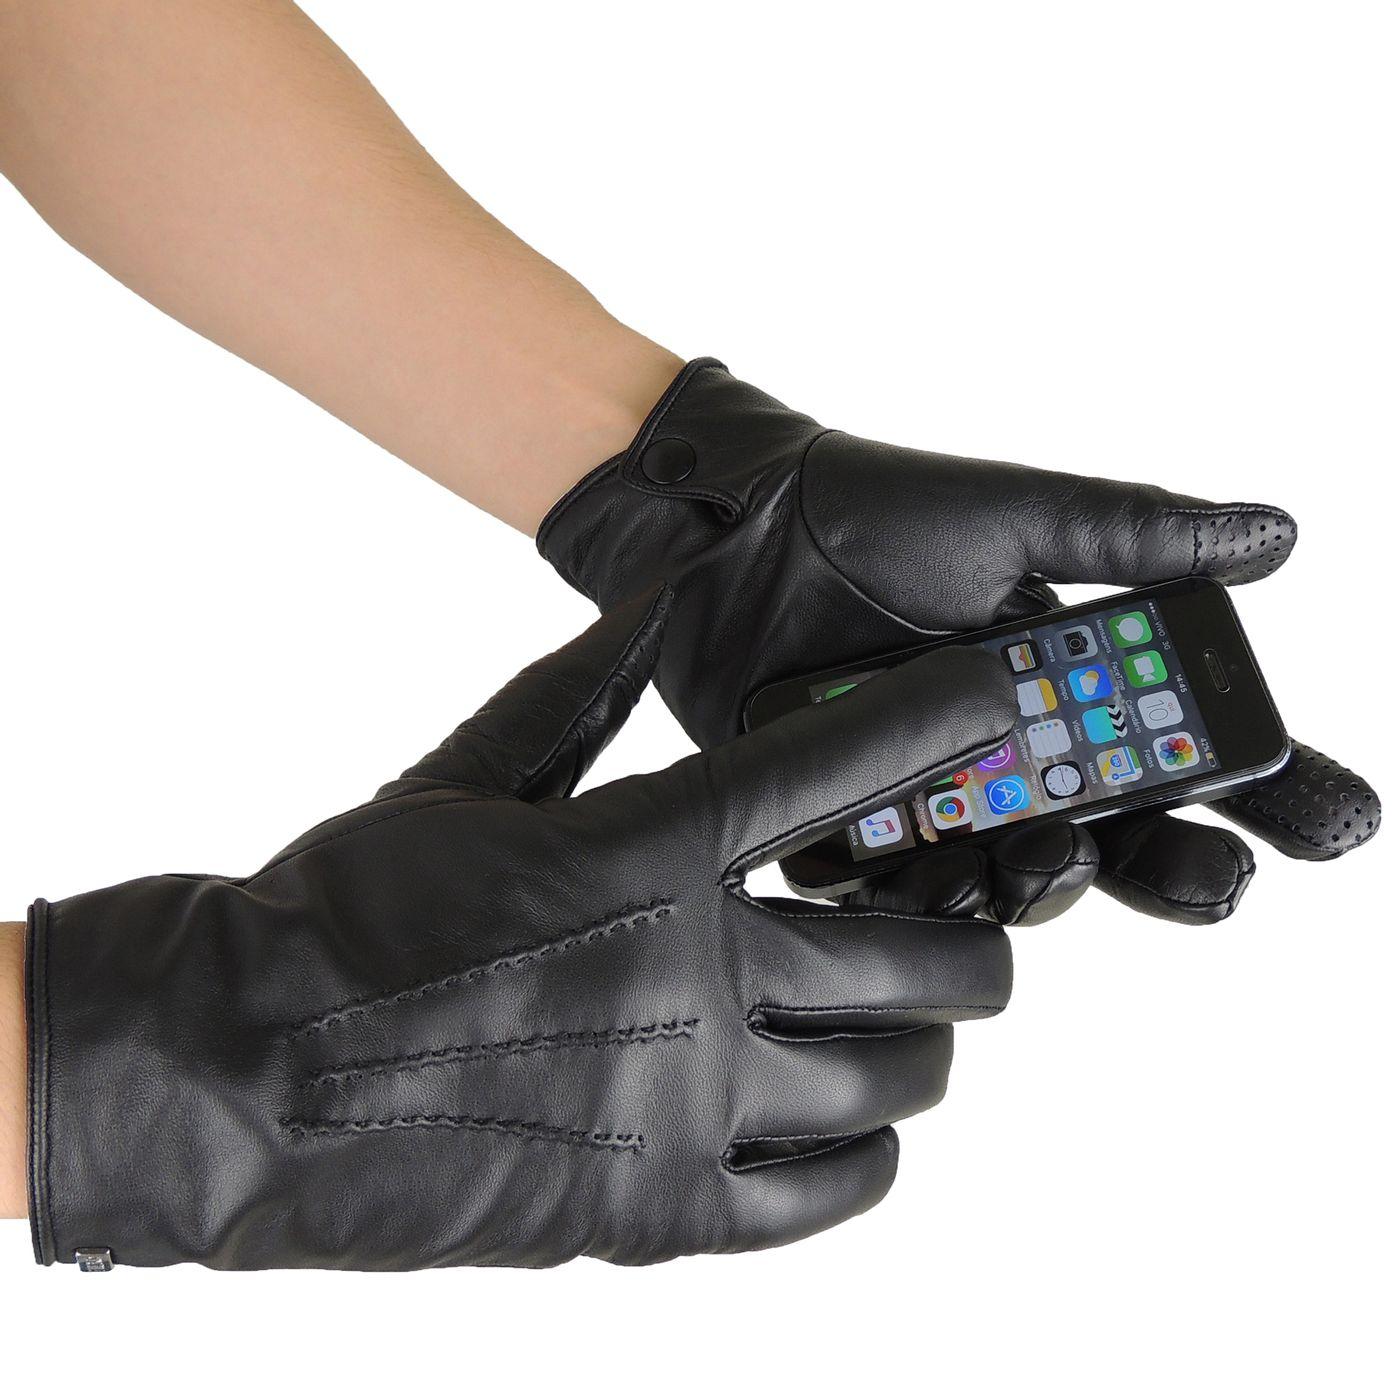 Luva Masculina Touch Screen em couro legítimo - fieroshop 0f69bed178d